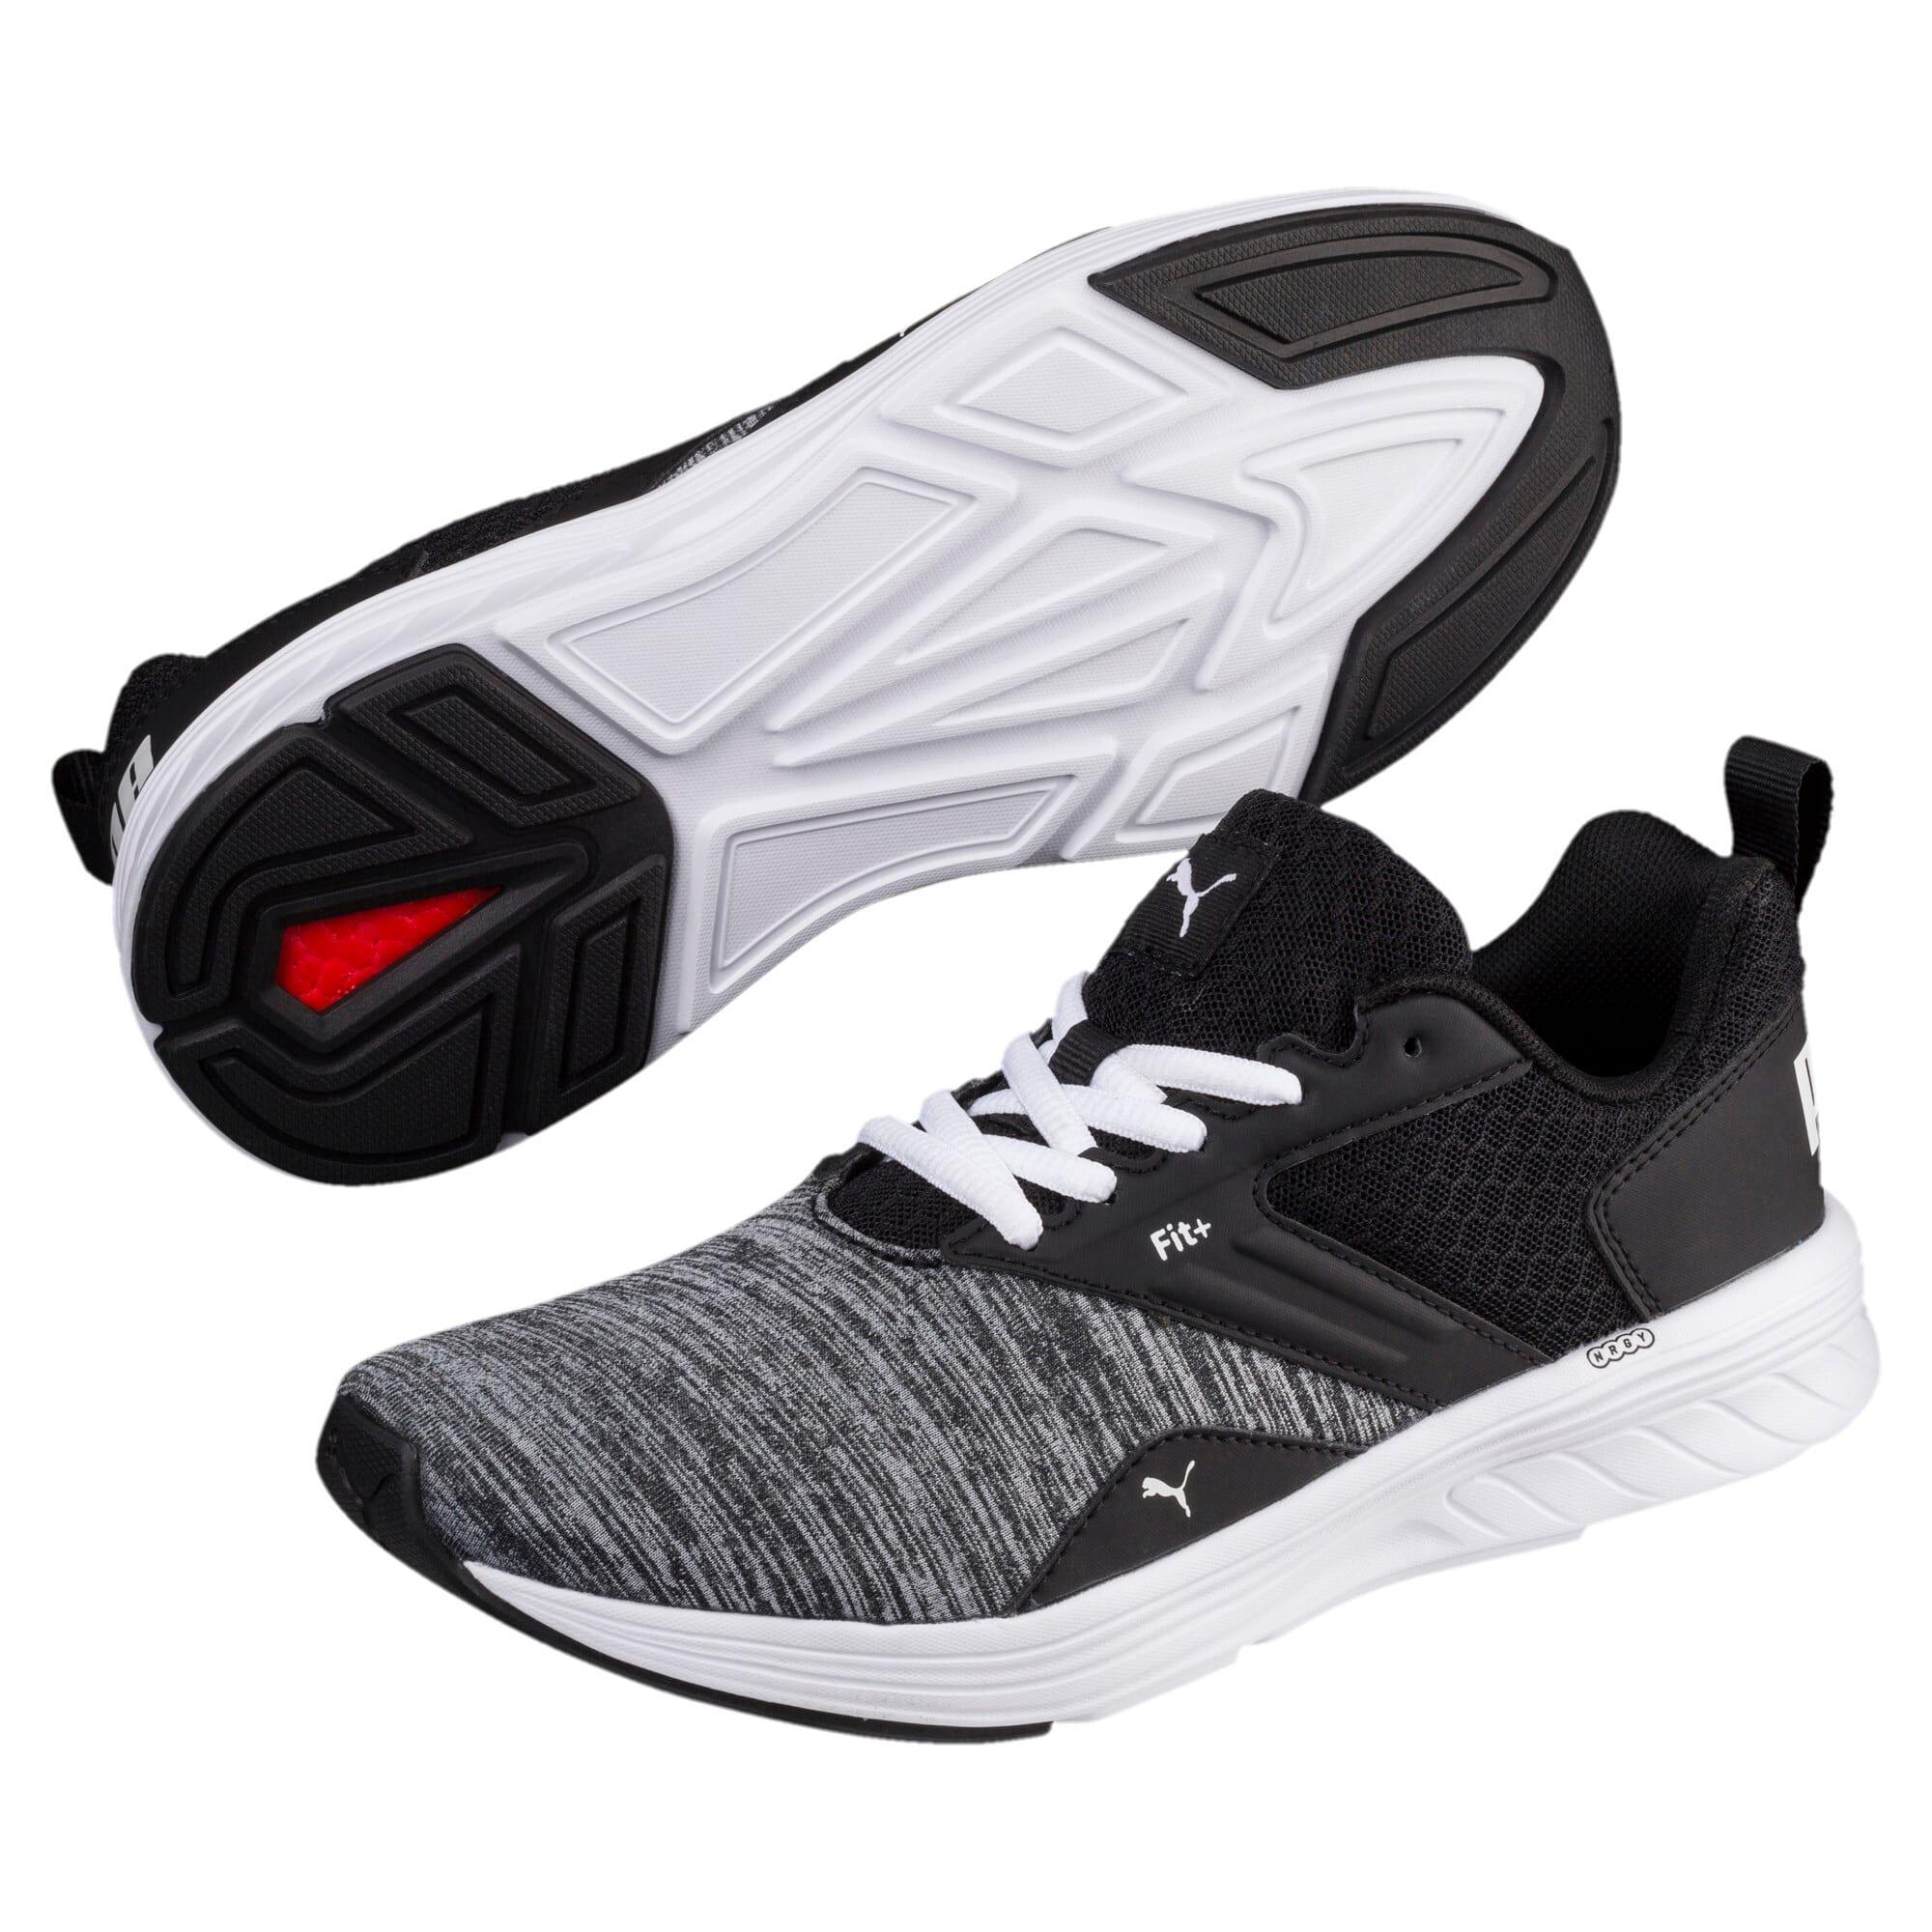 Thumbnail 6 of NRGY Comet Kids' Training Shoes, Puma White-Puma Black, medium-IND